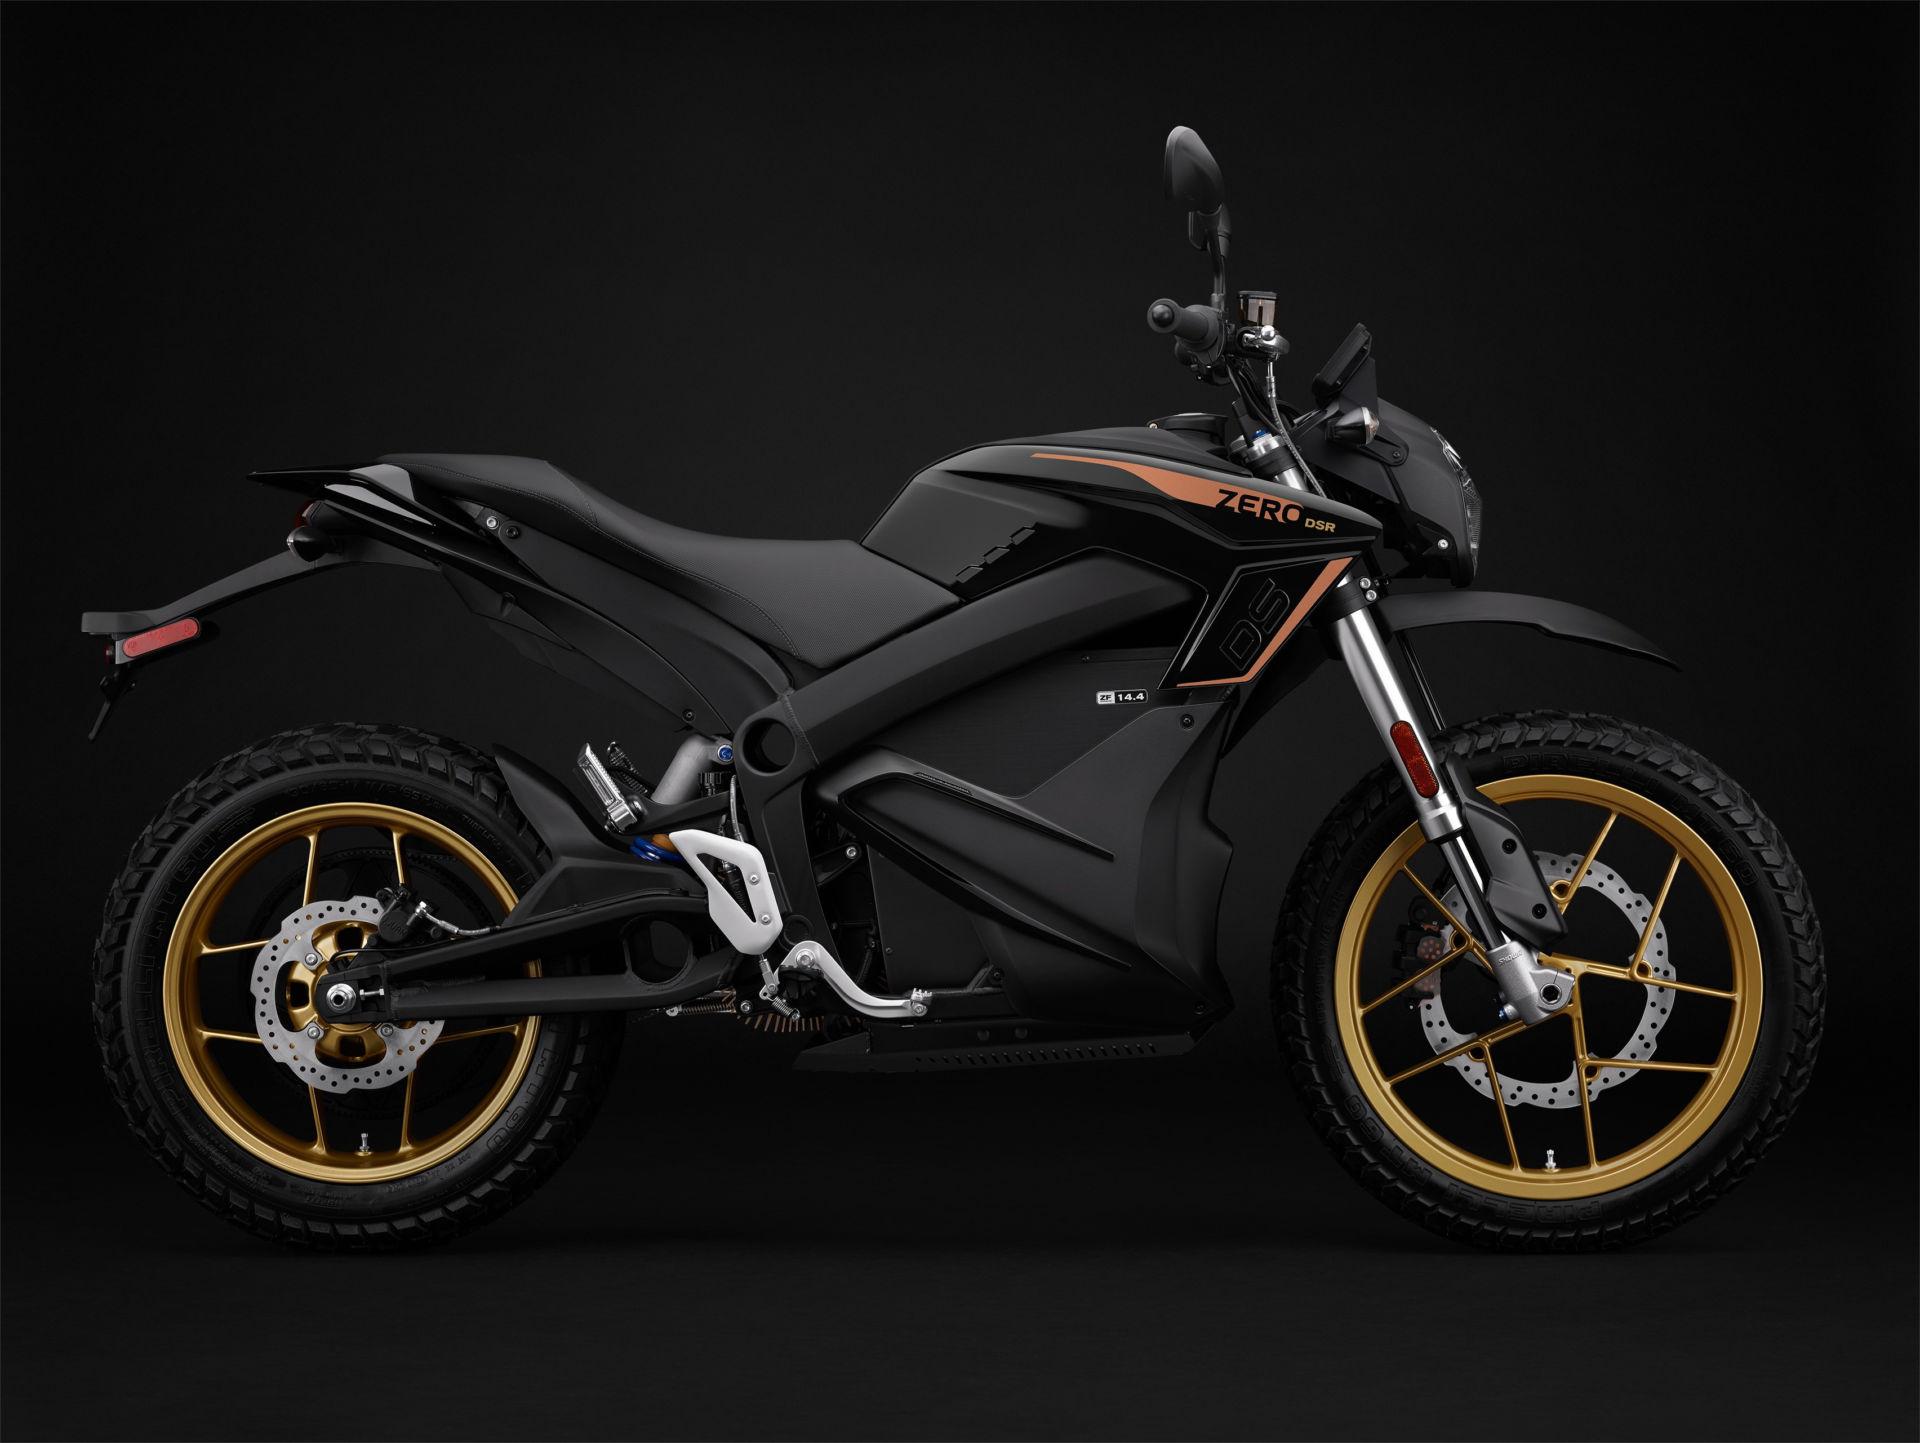 A 2022-model Zero DSR electric motorcycle. Photo courtesy Zero Motorcycles.